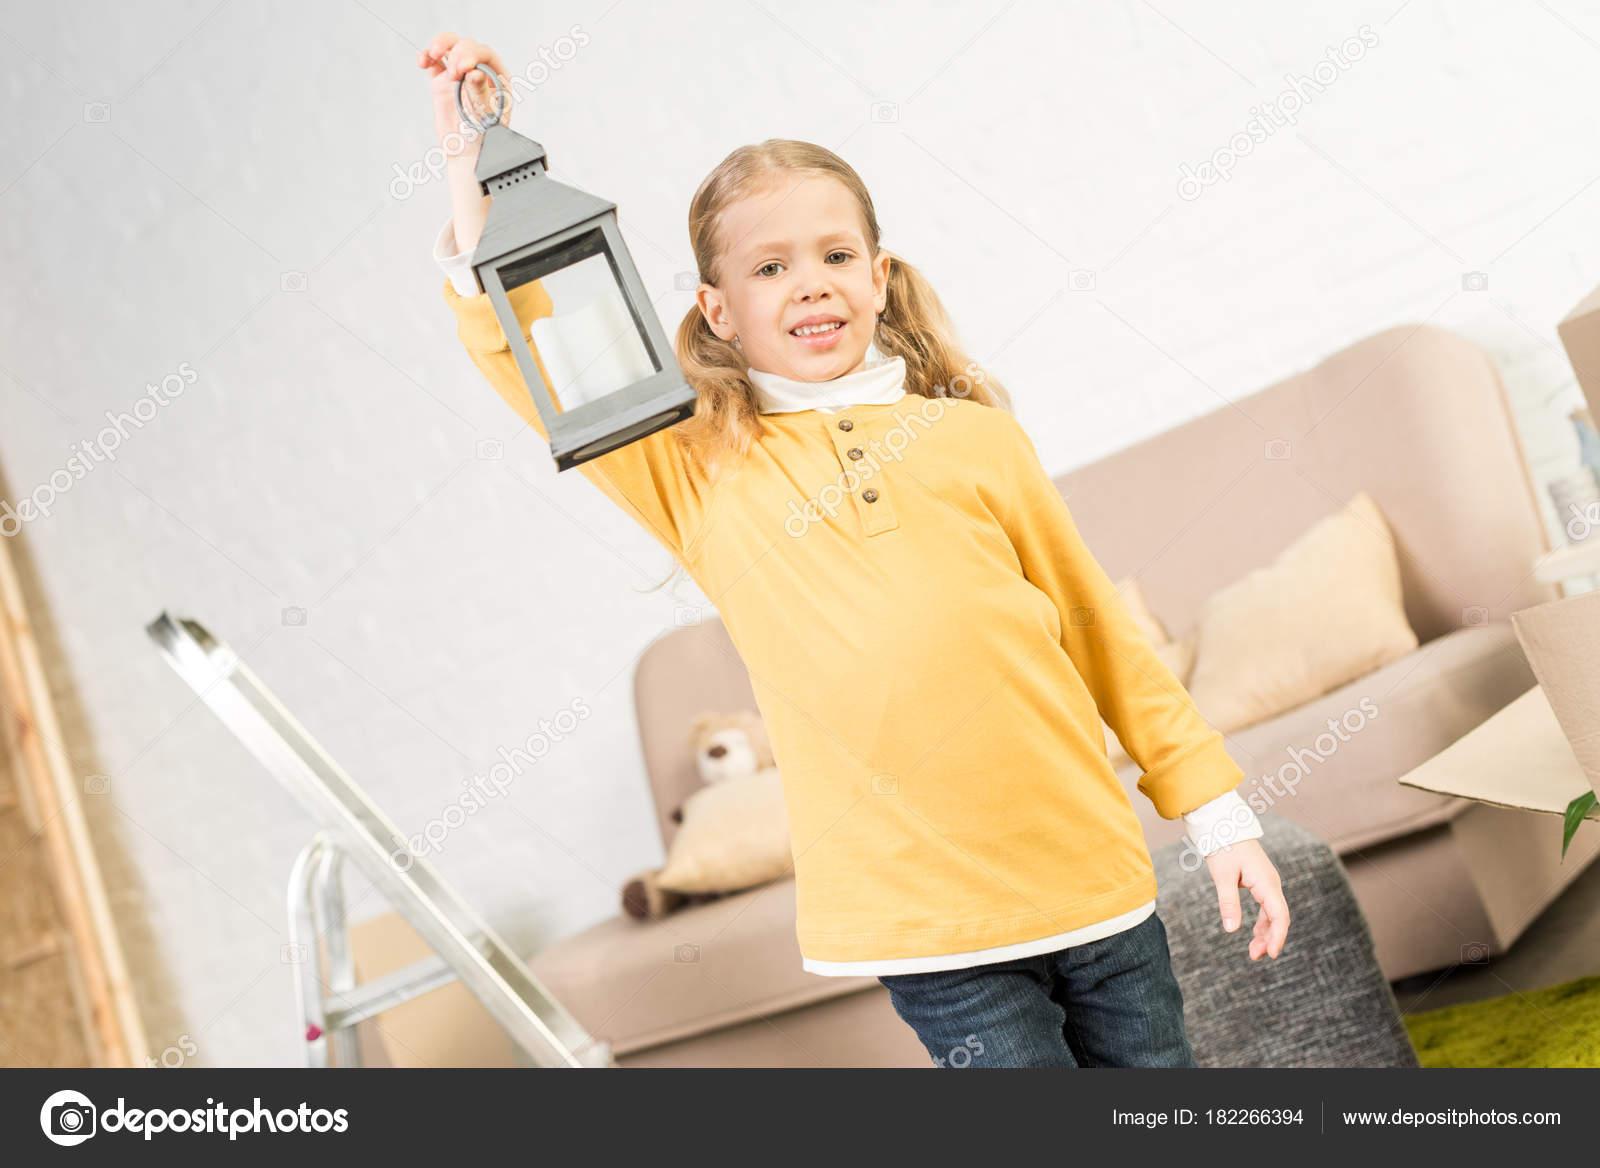 5e84805b18d5 Ευτυχισμένο Παιδάκι Κρατάει Φανάρι Και Χαμογελαστός Στην Κάμερα Ενώ ...